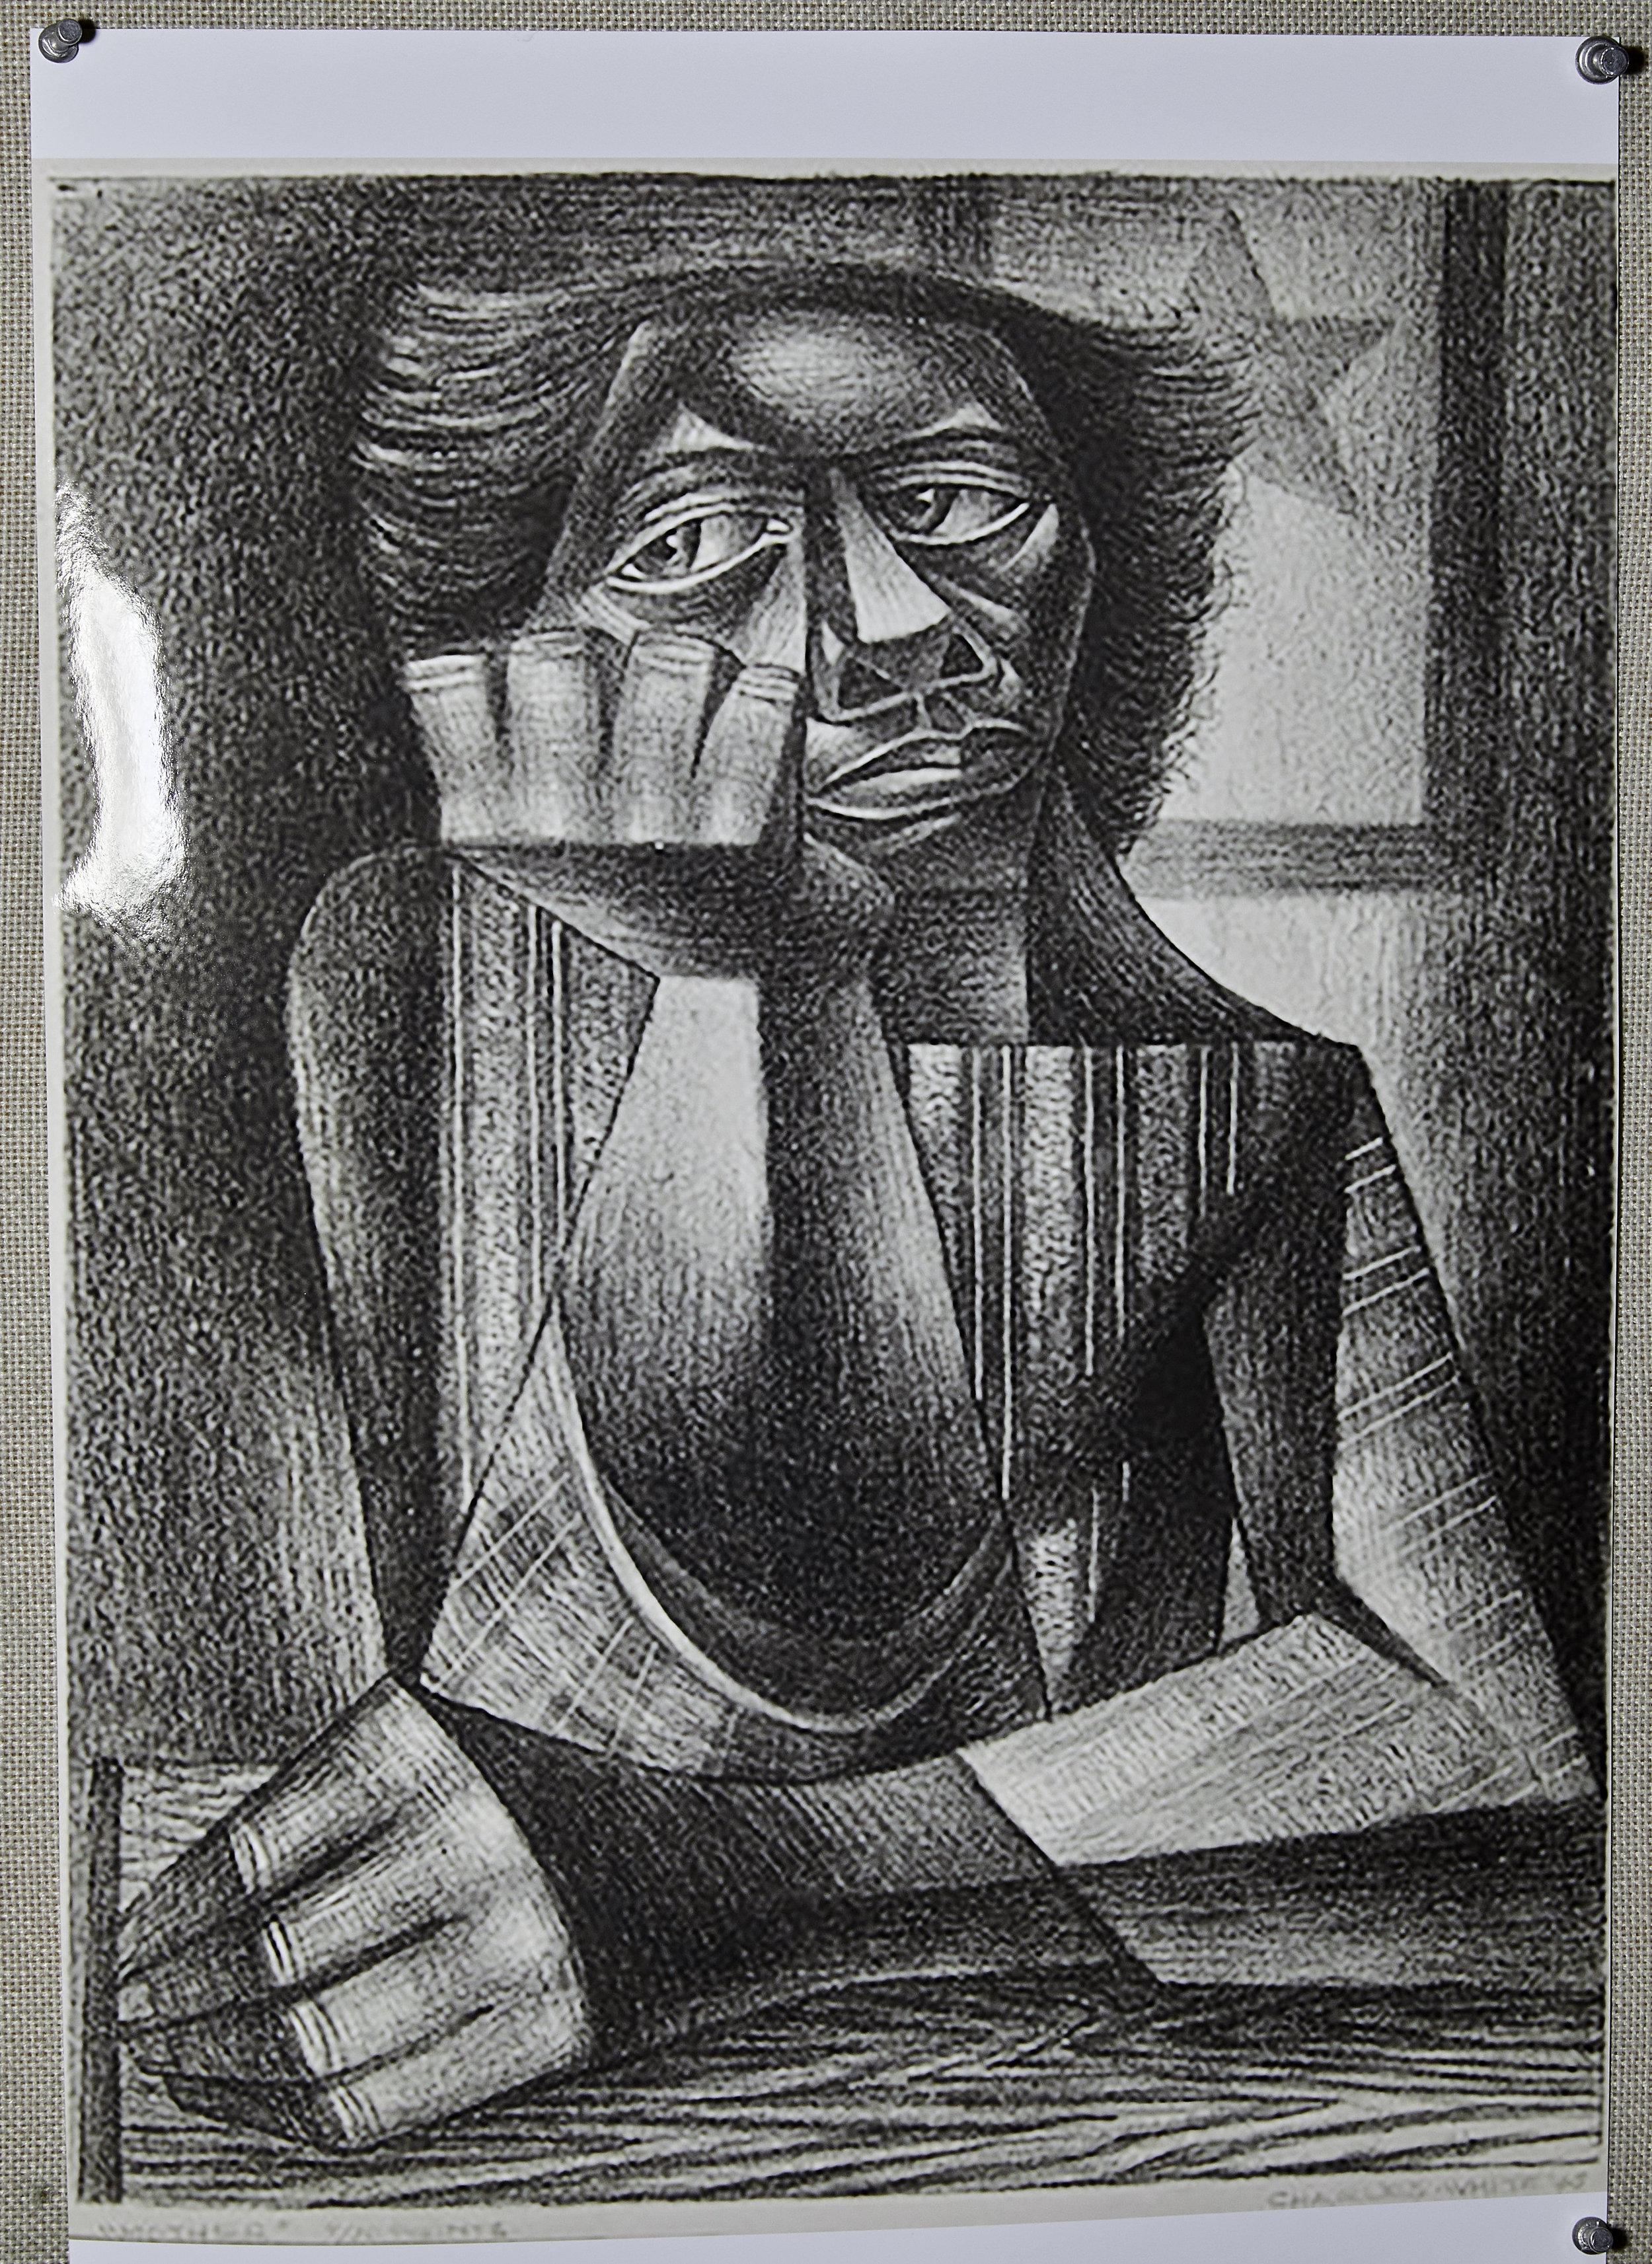 Black History Month Exhibit - Feb 05 2019 - 0061.jpg